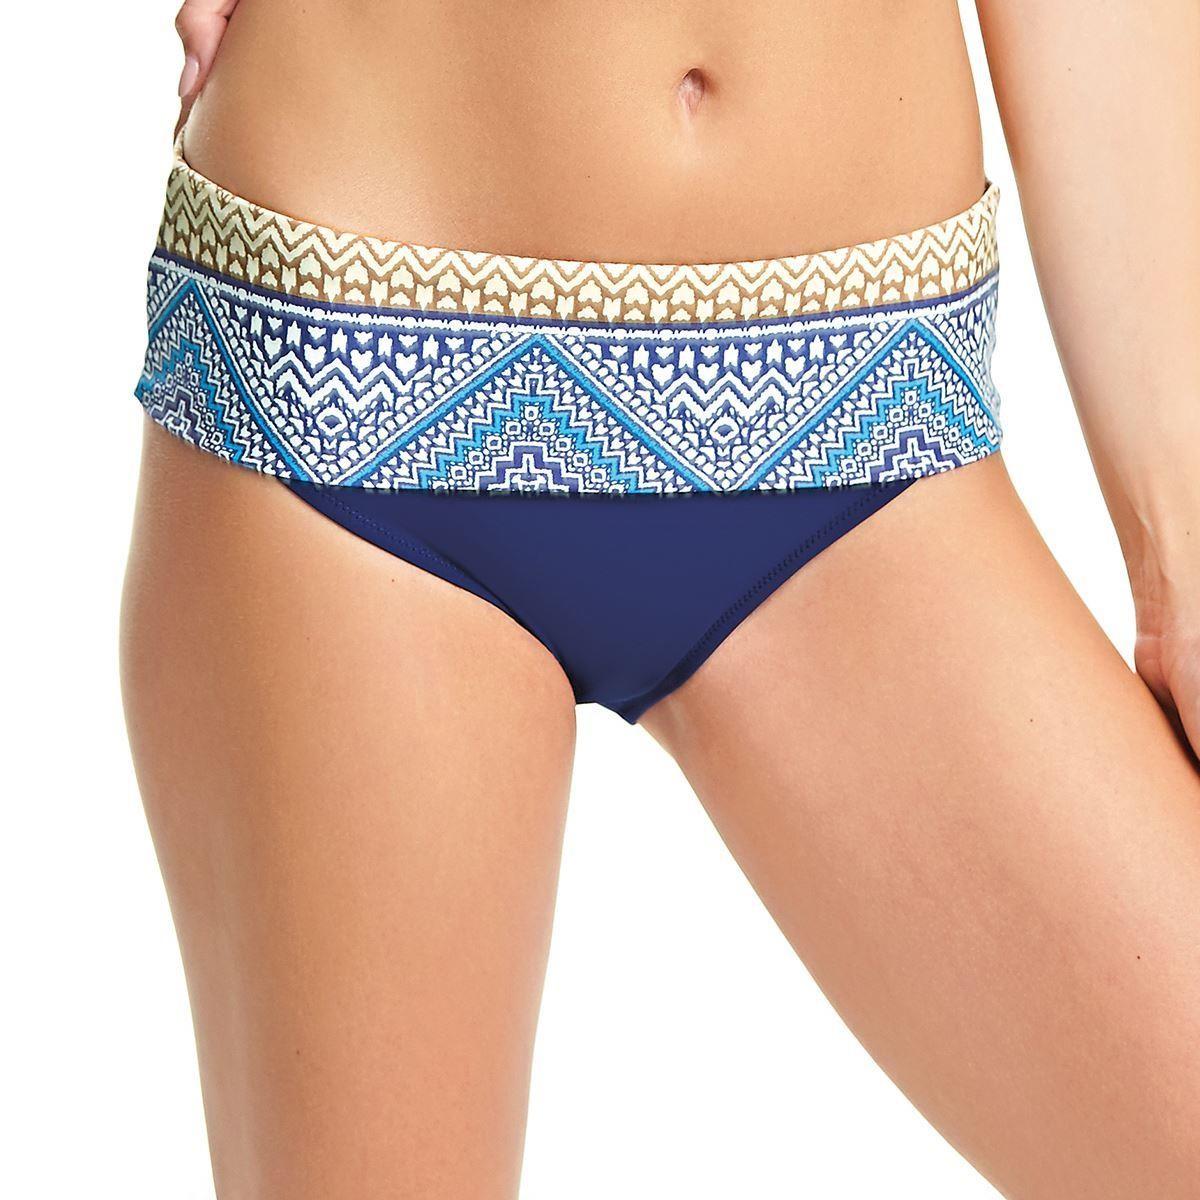 Fantasie Granada Classic Fold Bikini Brief - Ink